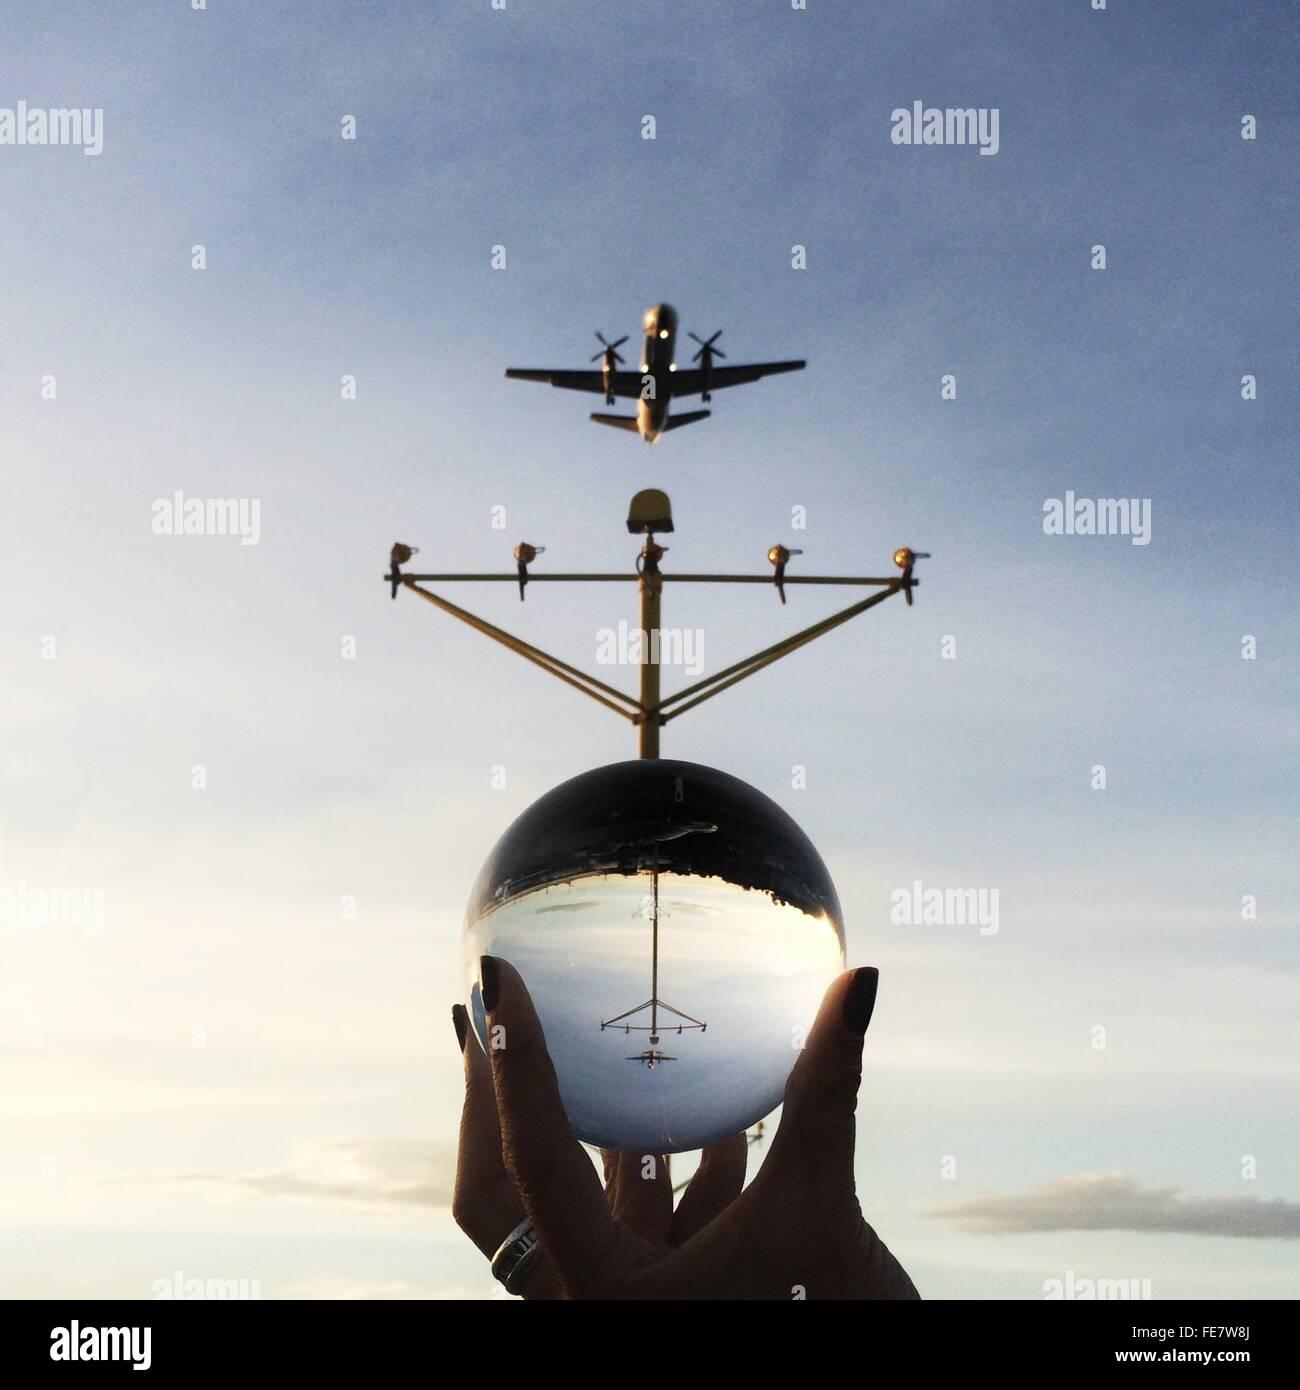 Reflexion des Flugzeugs In Glaskugel Stockbild